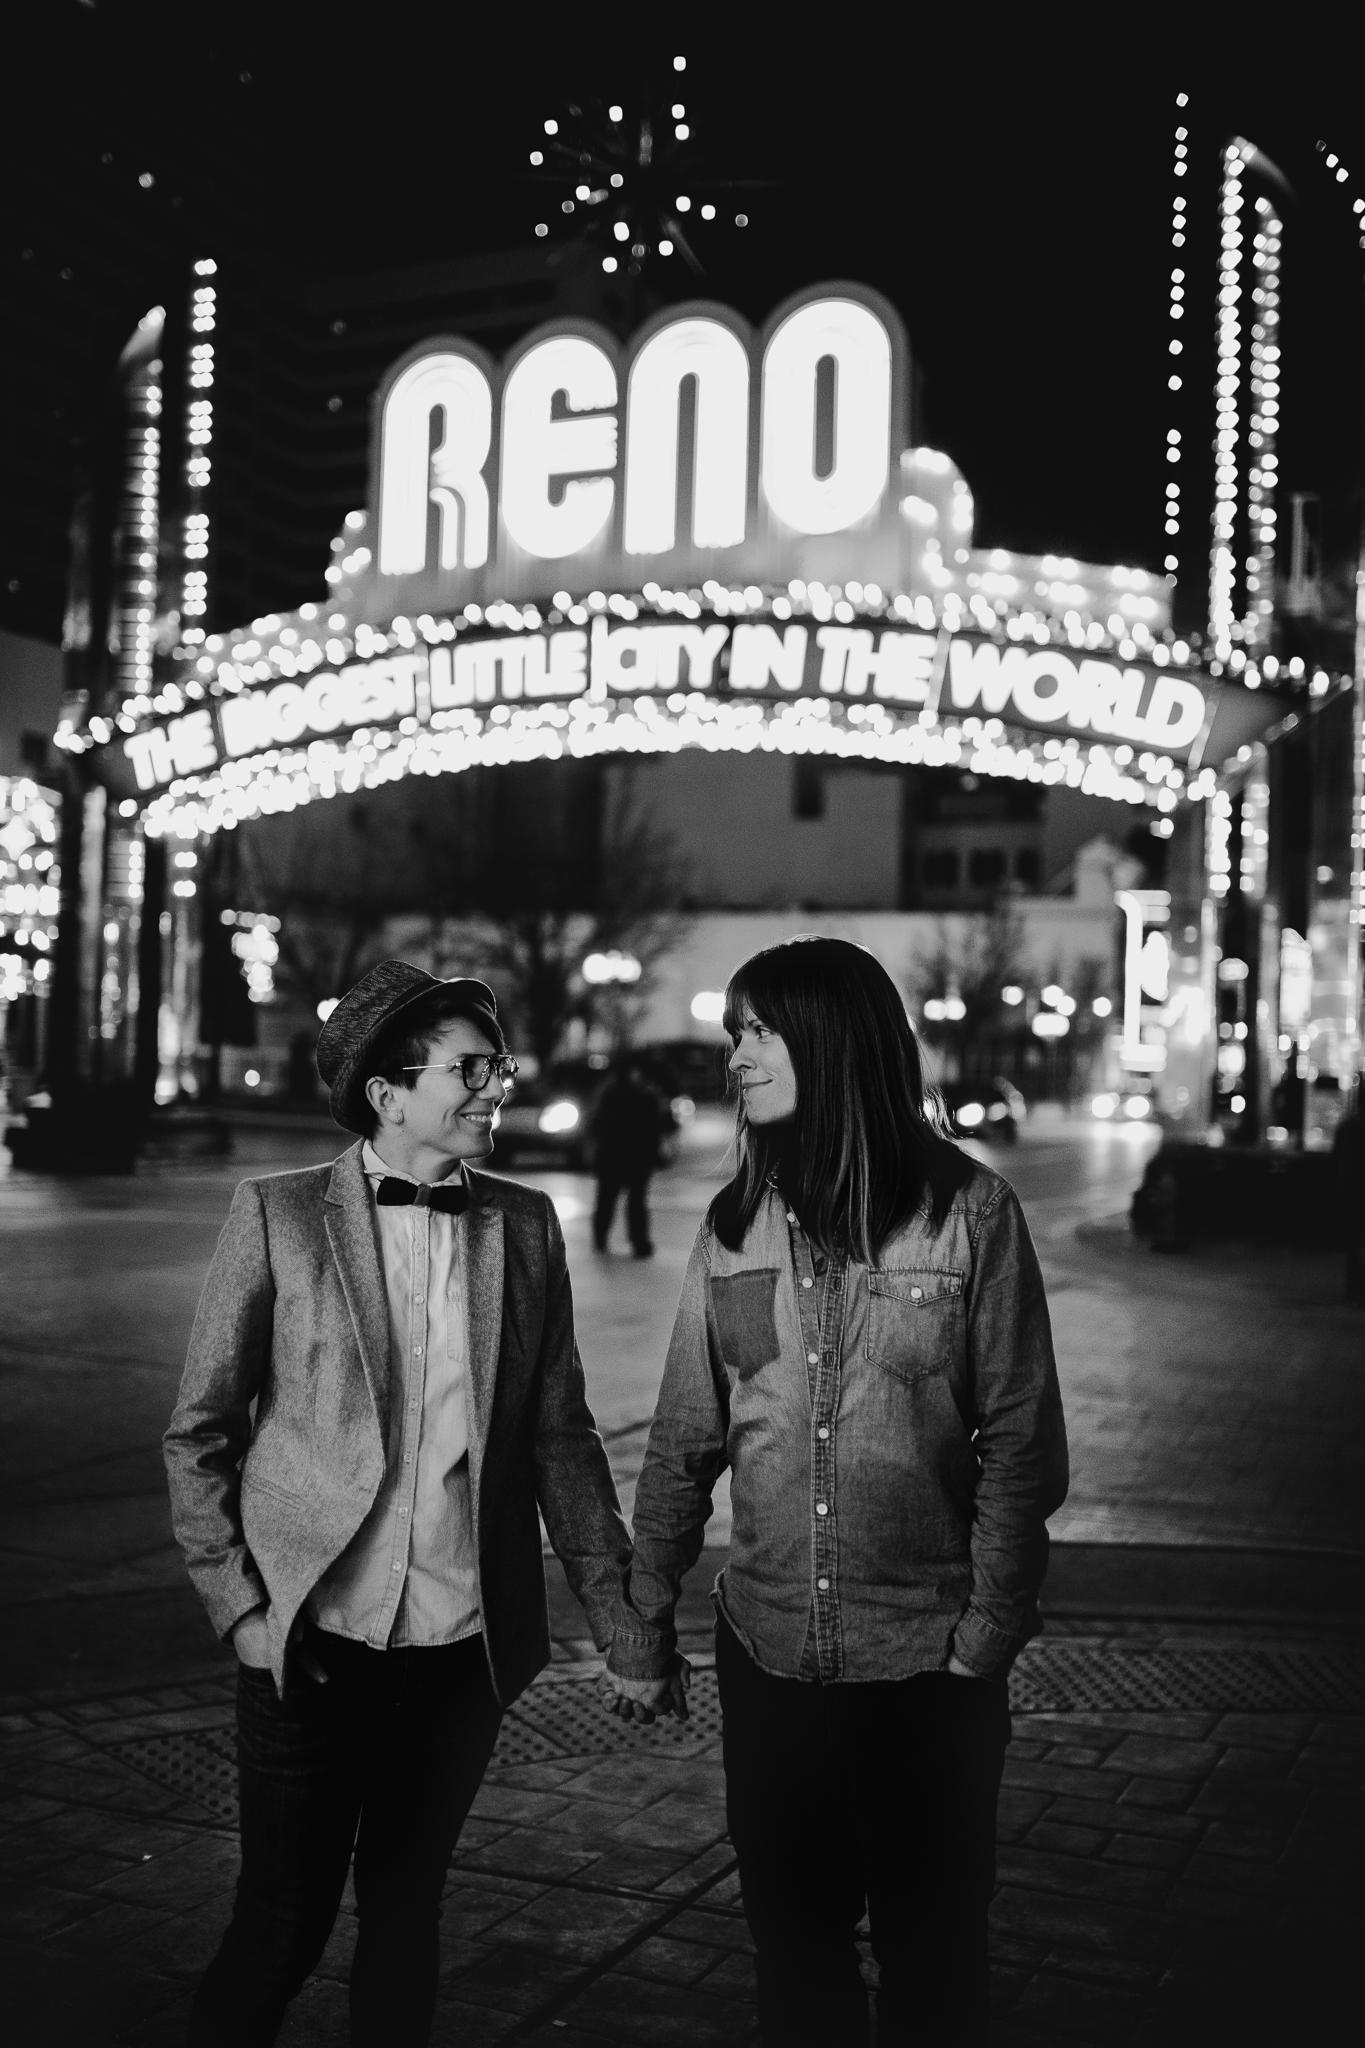 Archer Inspired Photography Hilary and Gia LGTBQ Reno Nevada Couple Wedding Engagement Photographer-6.jpg